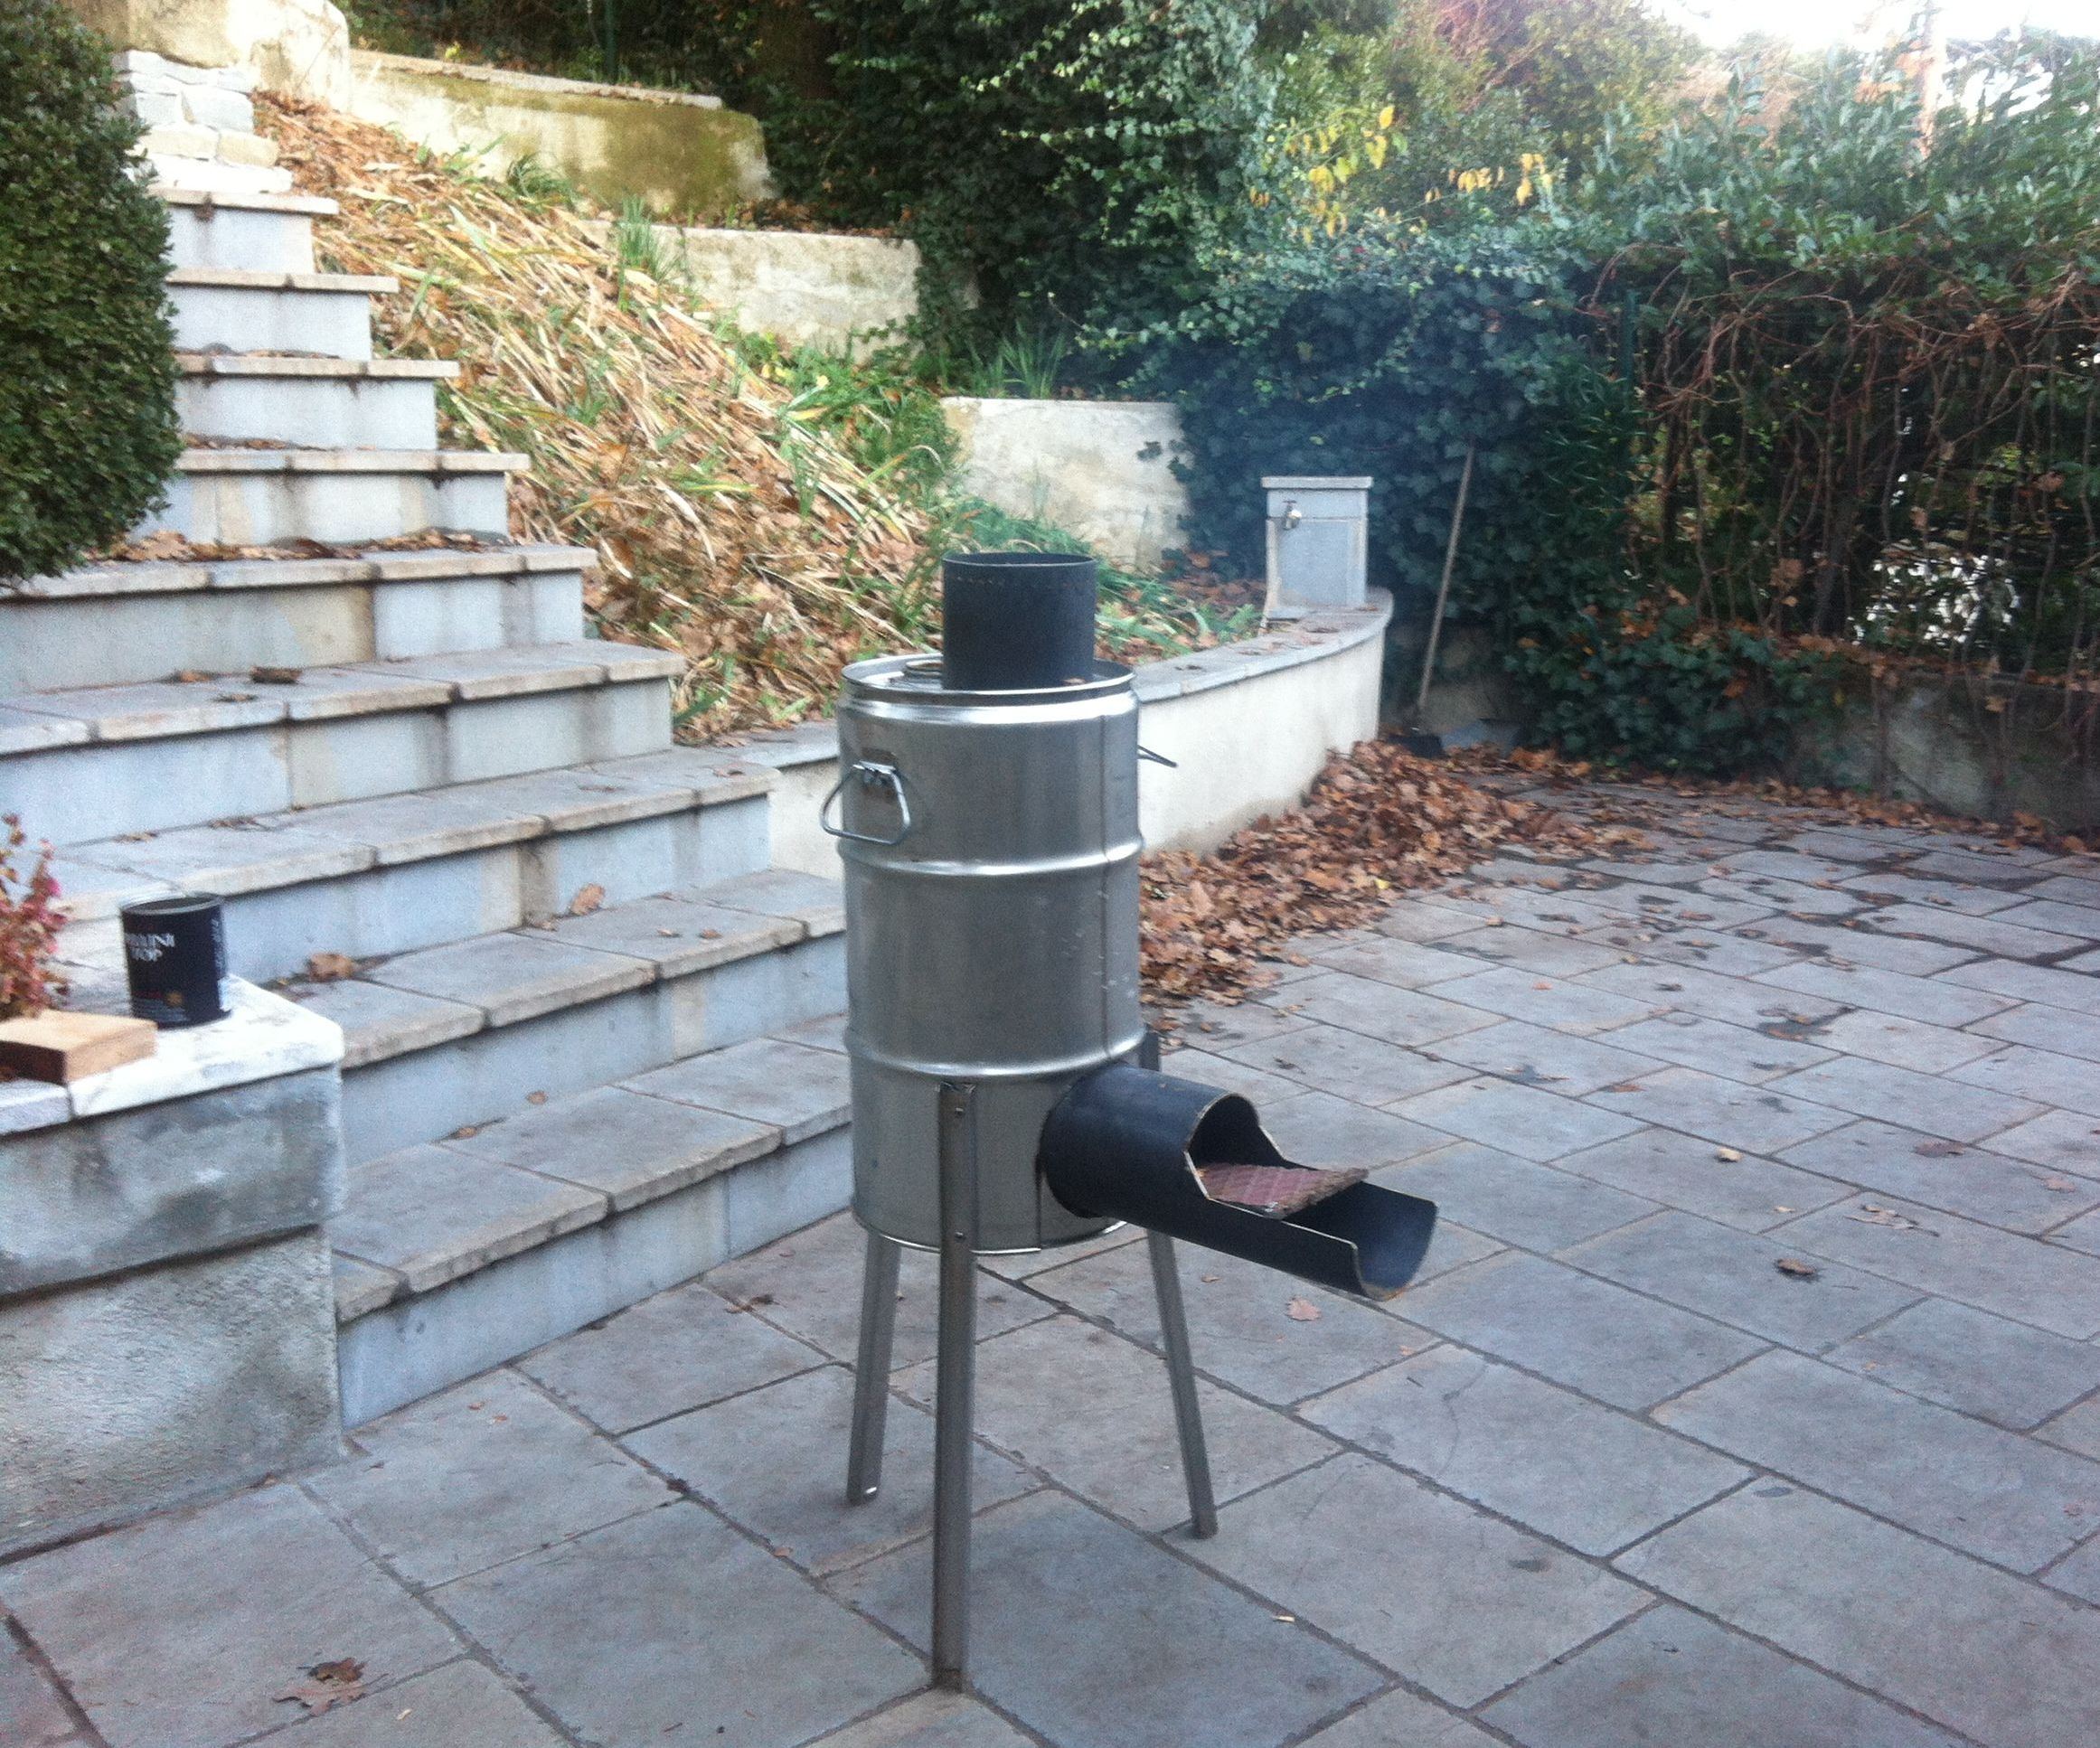 Rocket stove and BBQ